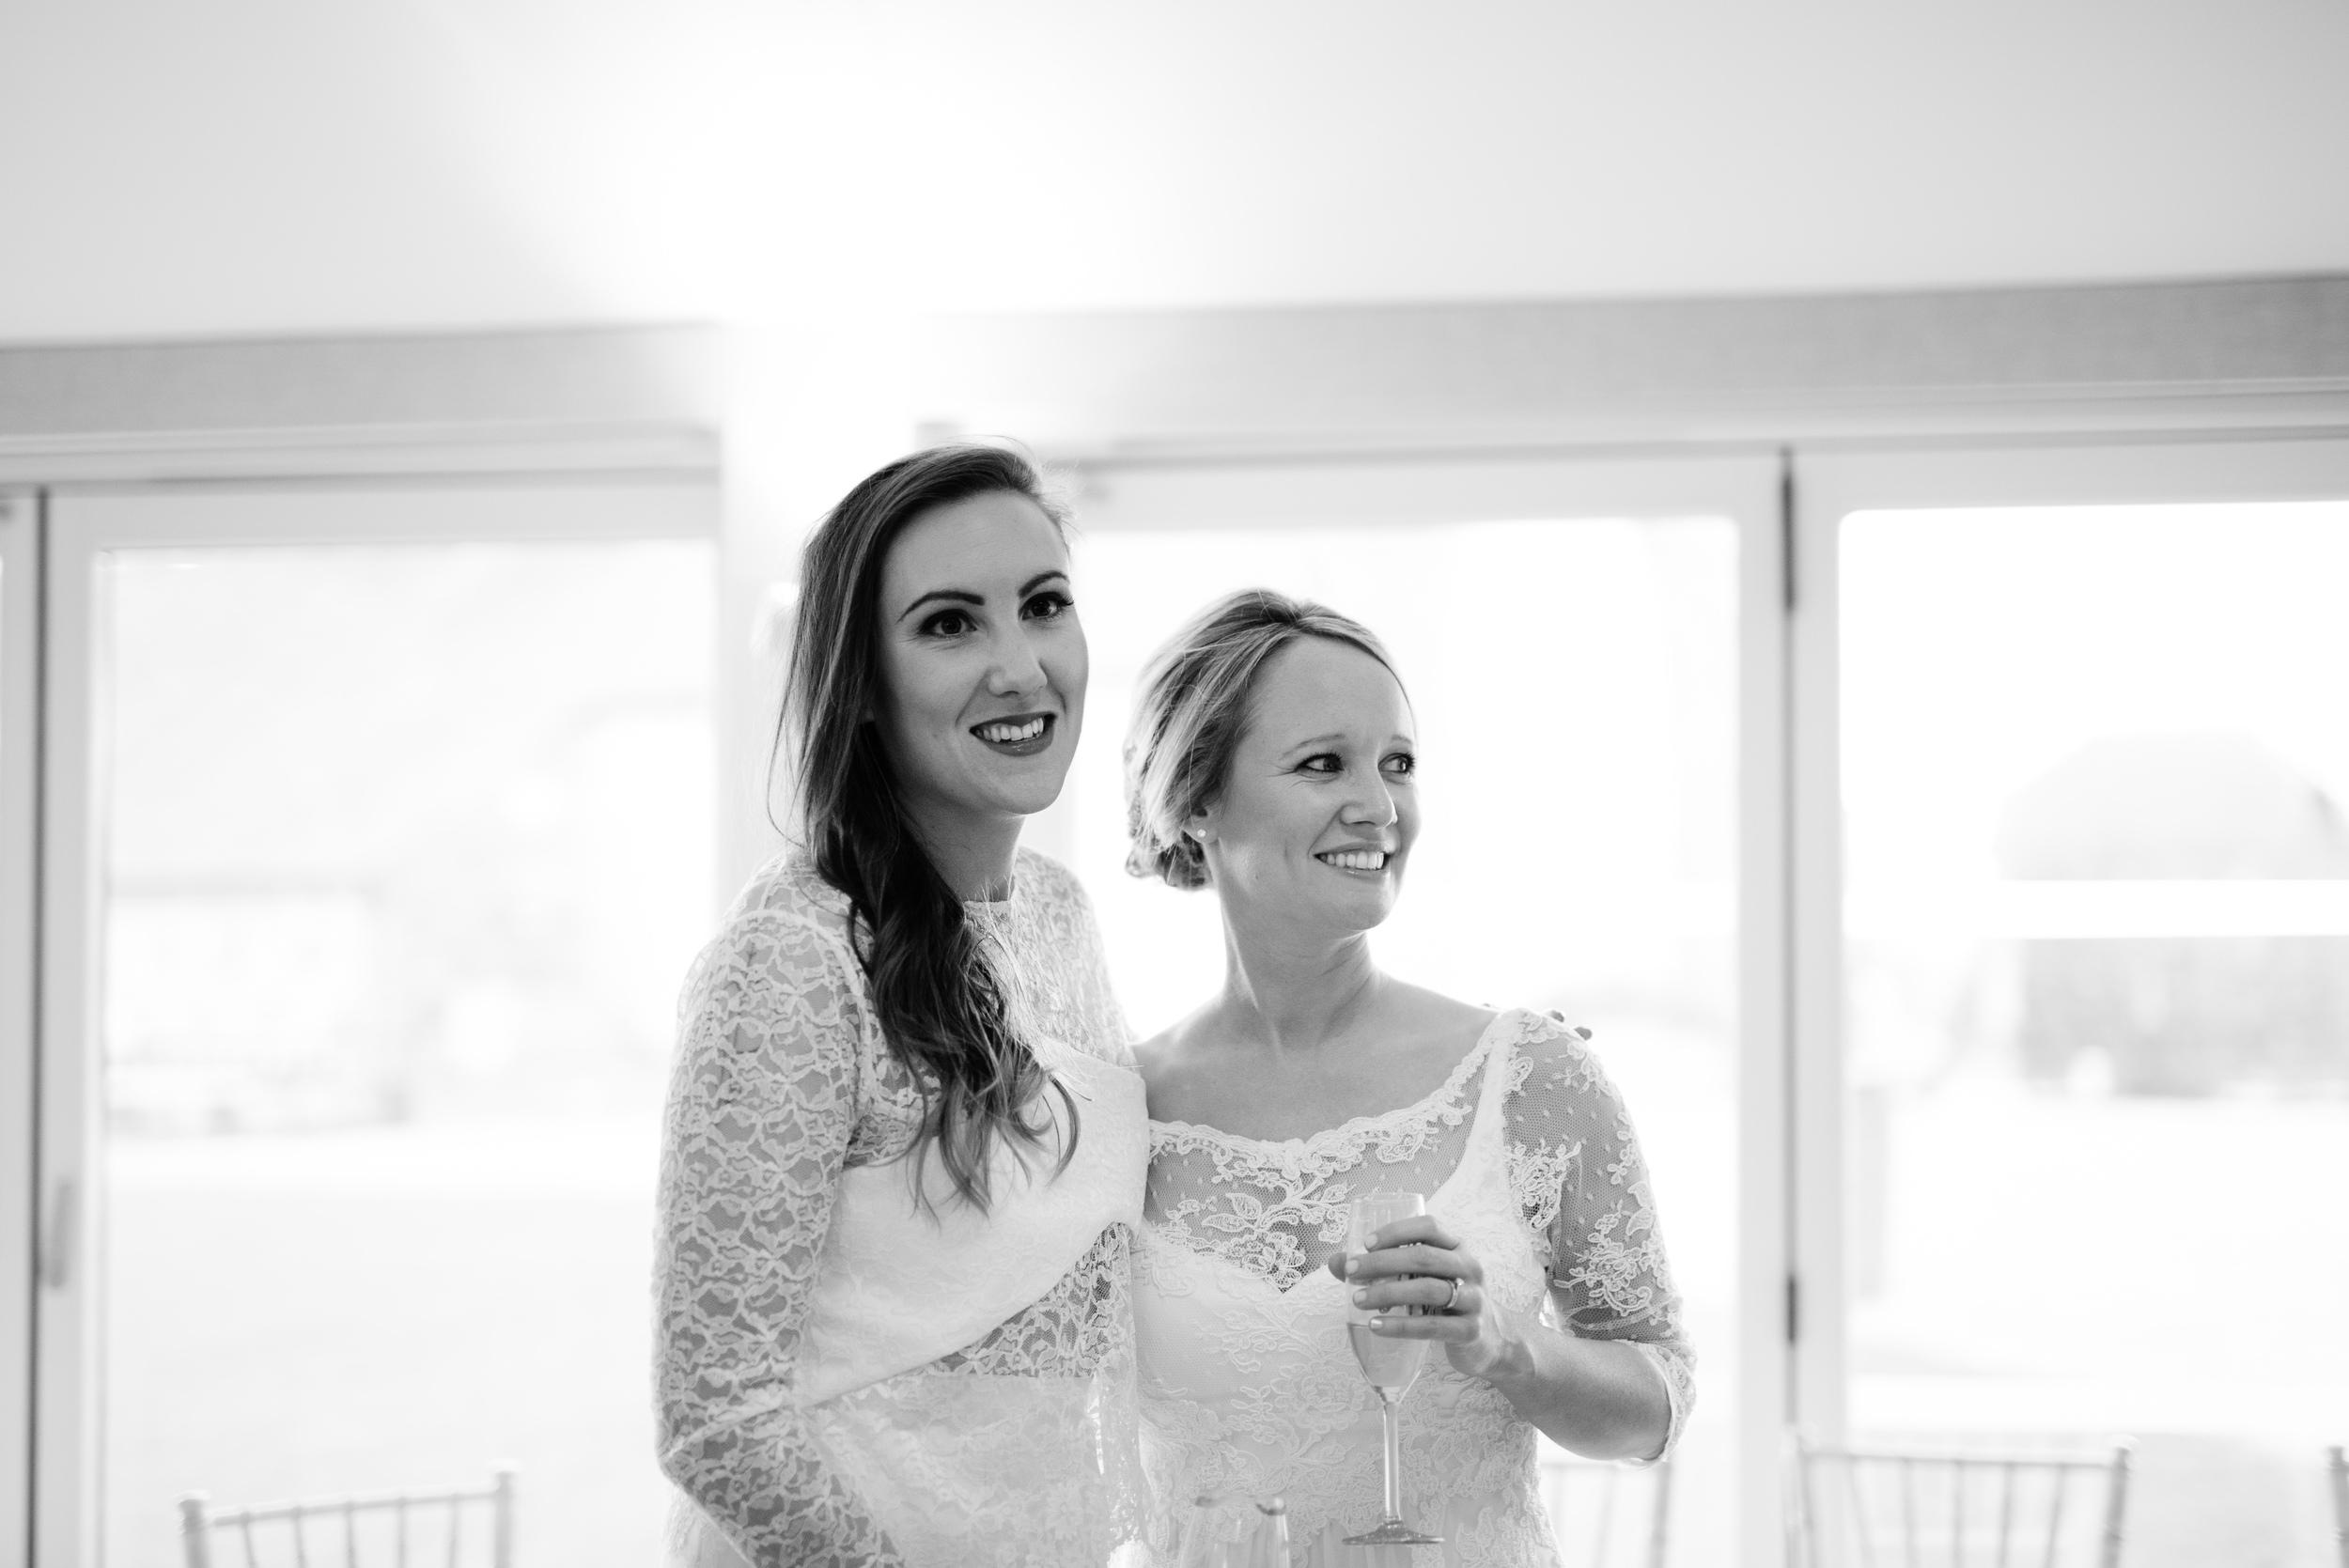 Wasing Park Wedding Photography - Emma & Sarah-344.jpg